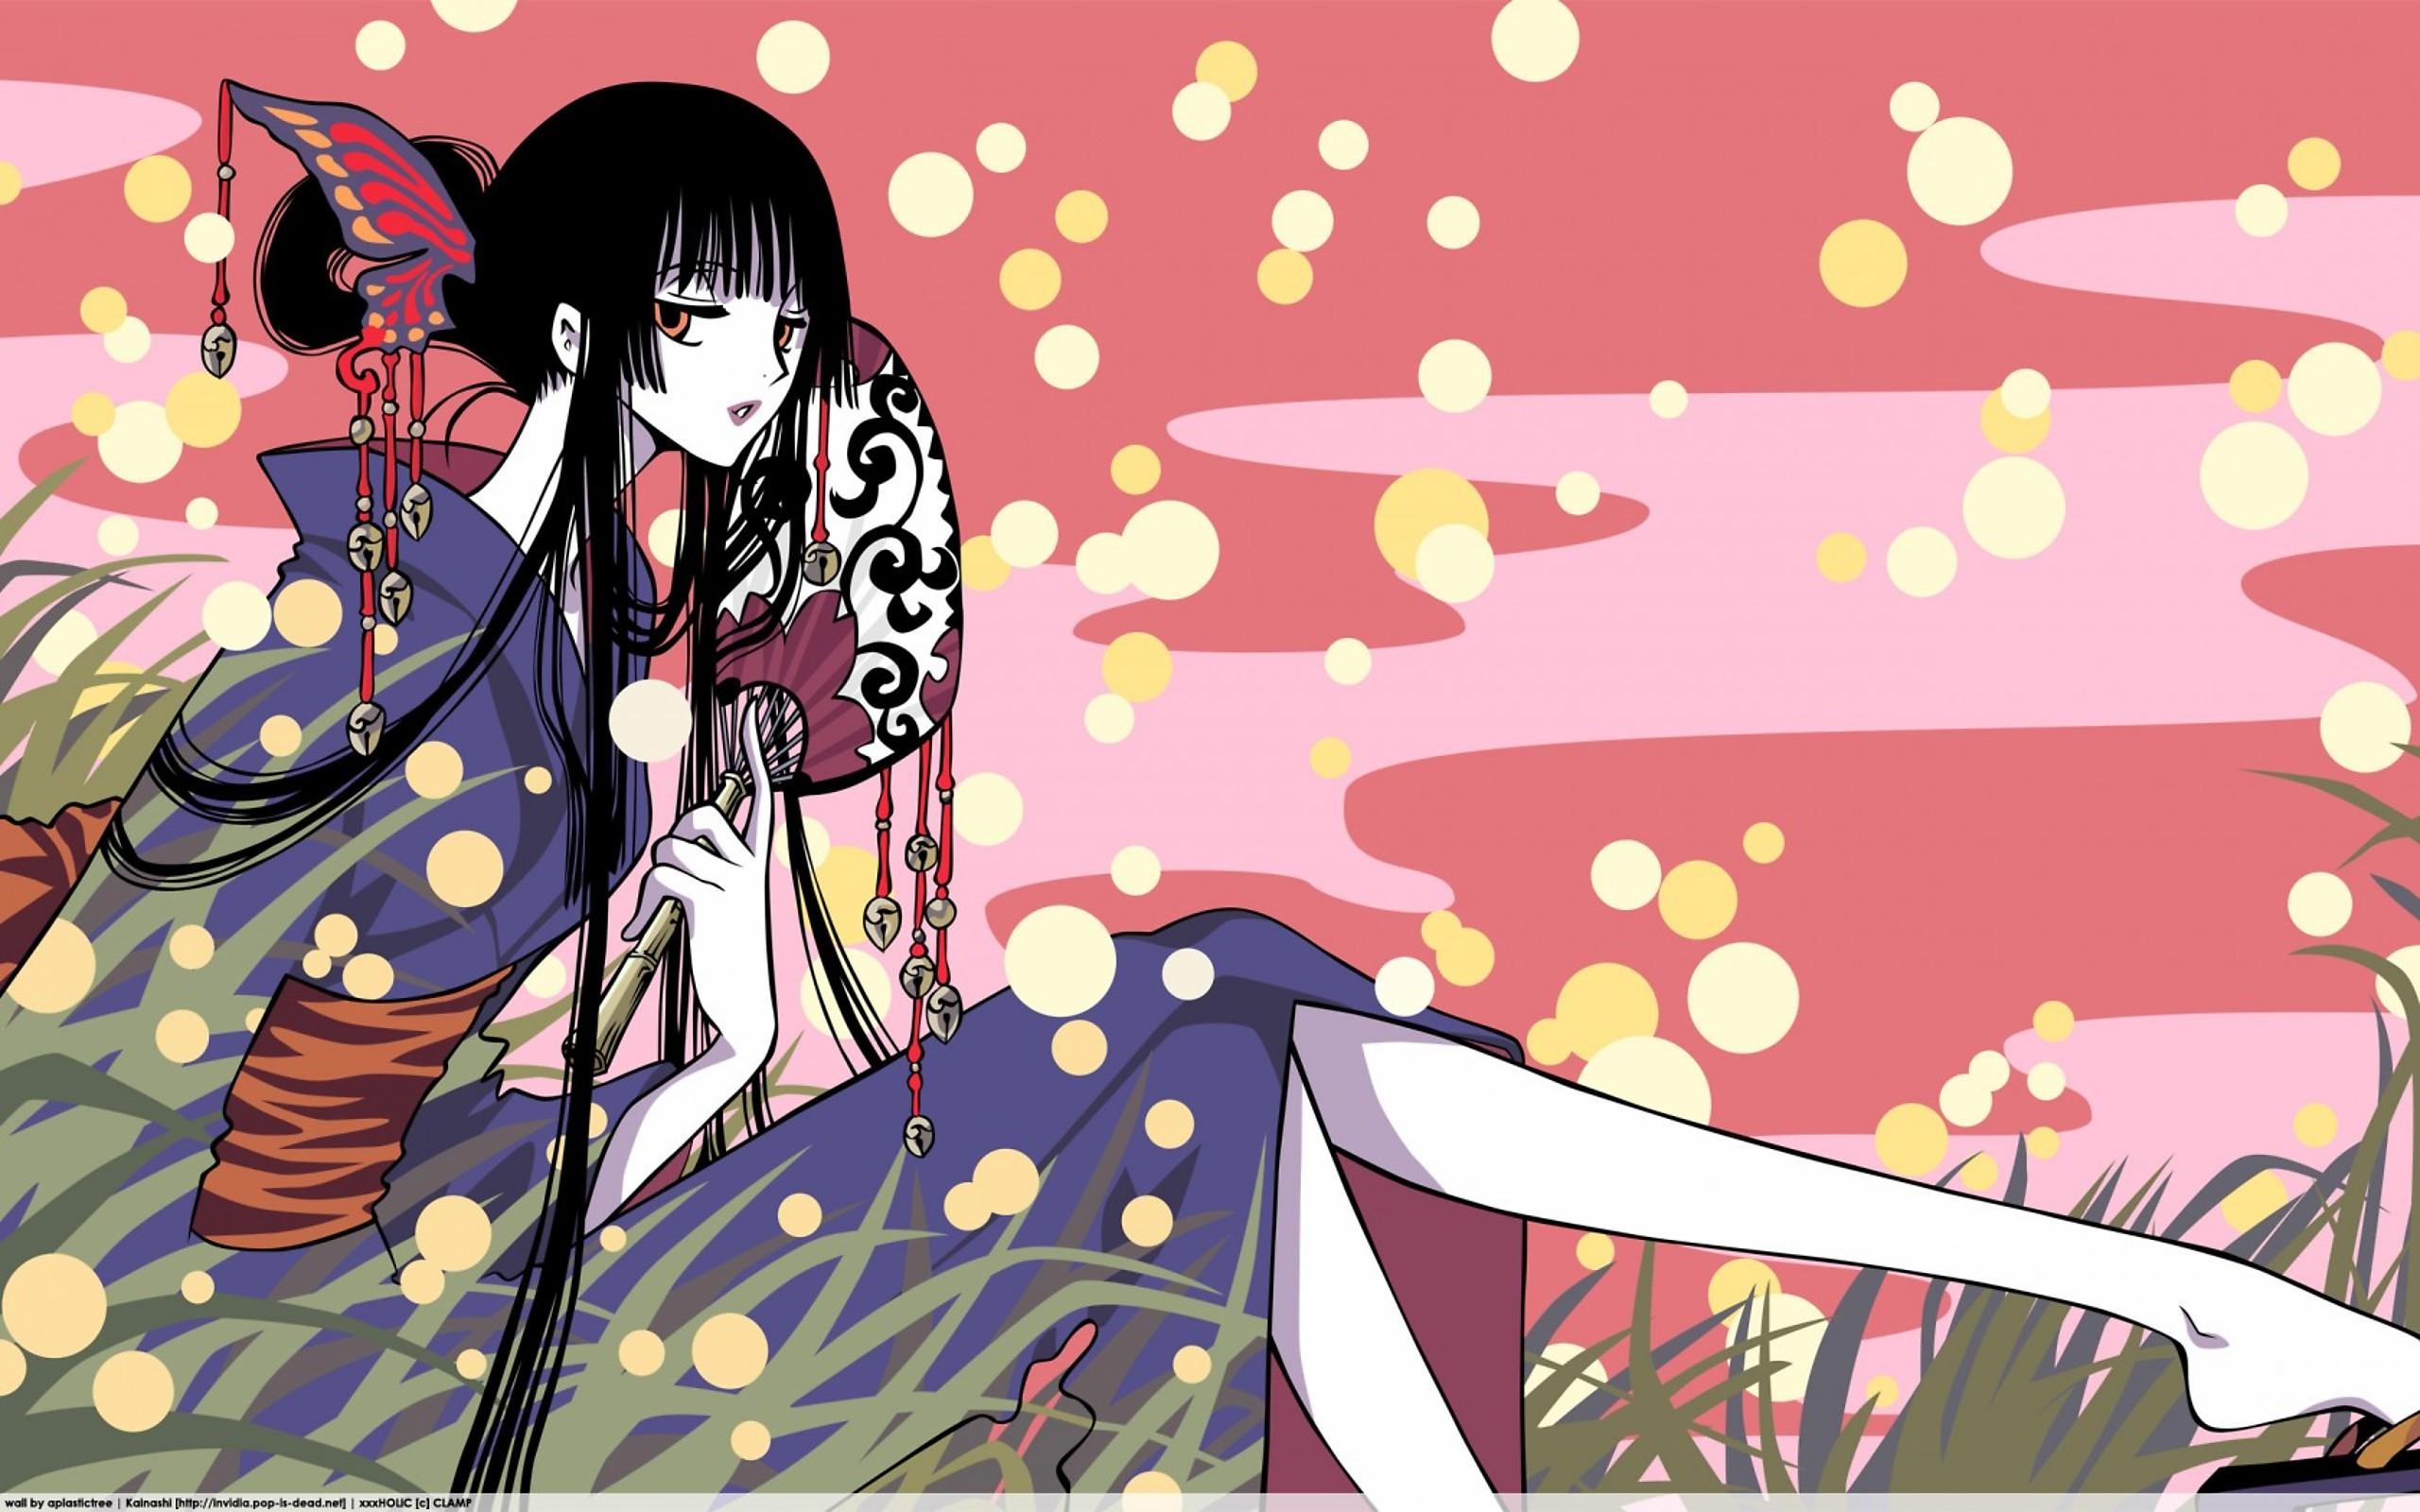 sakura pro live wallpaper download